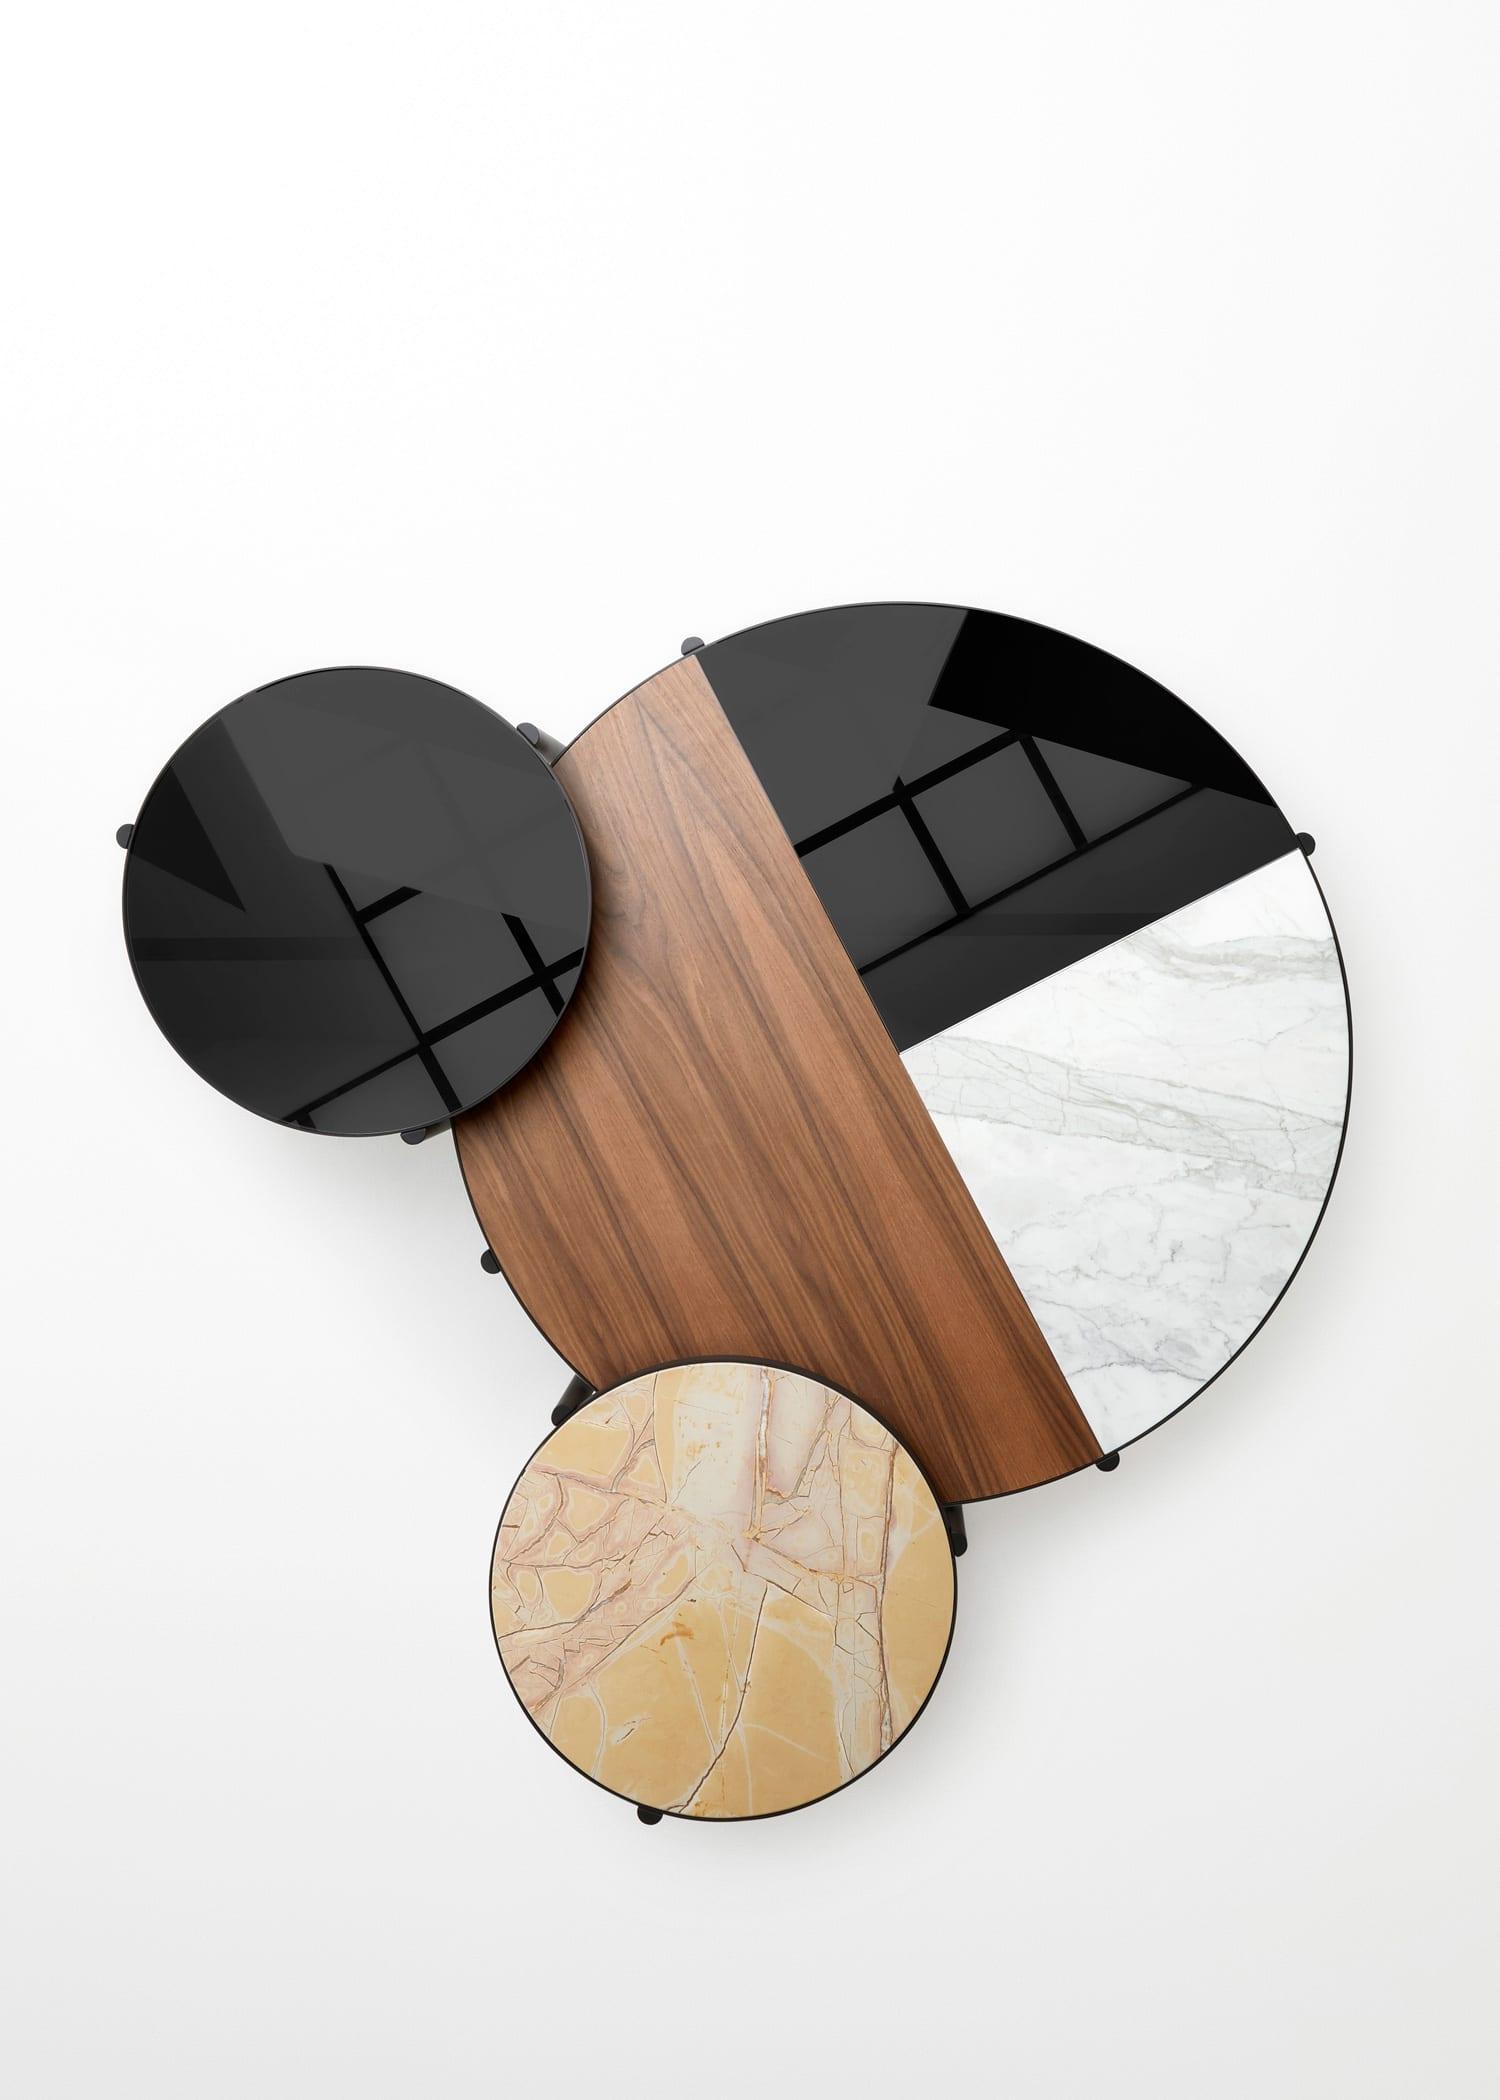 Australian Designers in Milan: Noon tables byRoss Gardam | #Milantrace2018